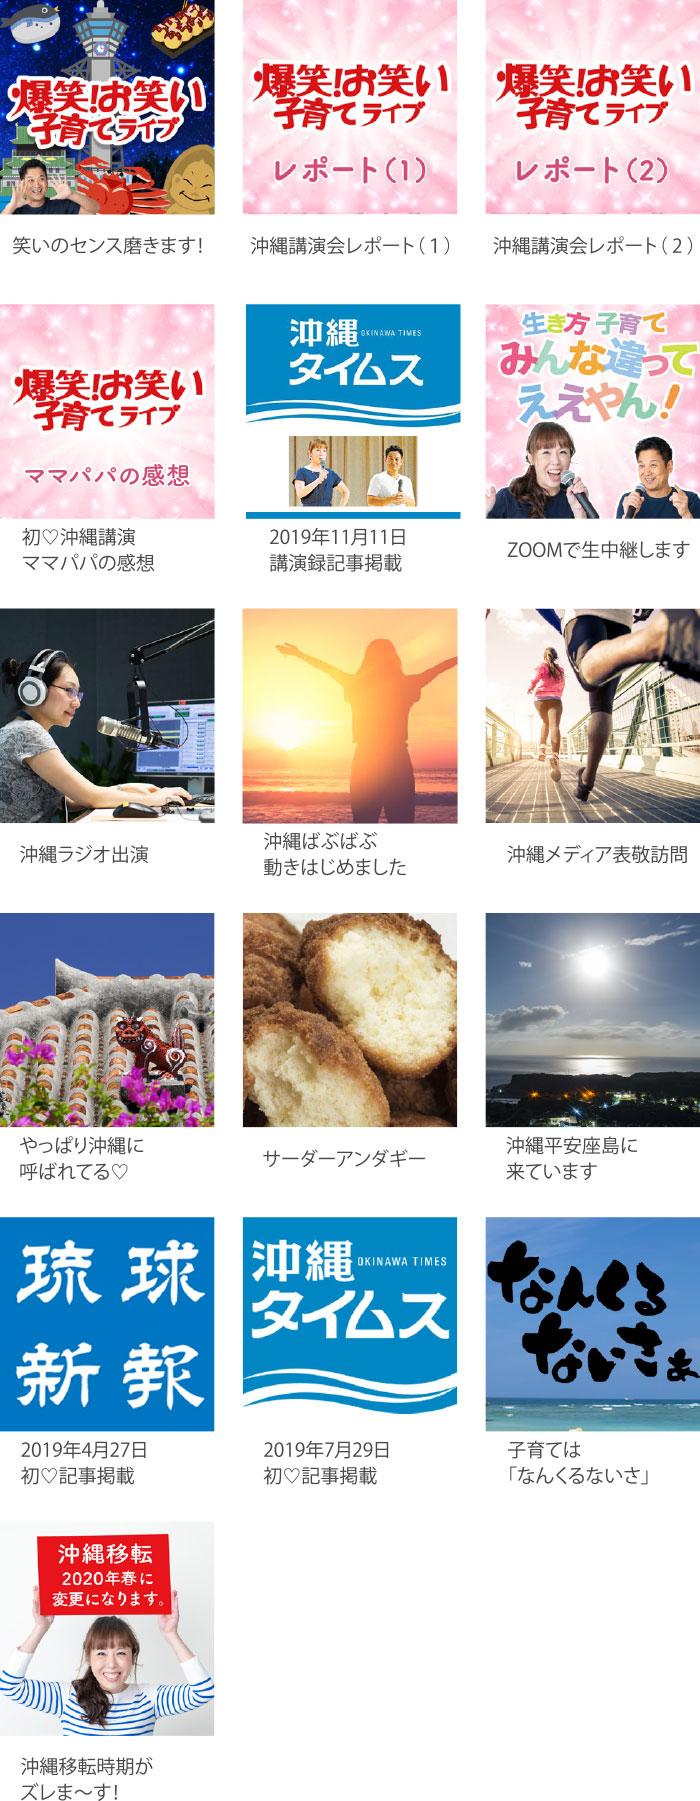 all blog okinawa - サーダーアンダギー(沖縄のおみやげ)